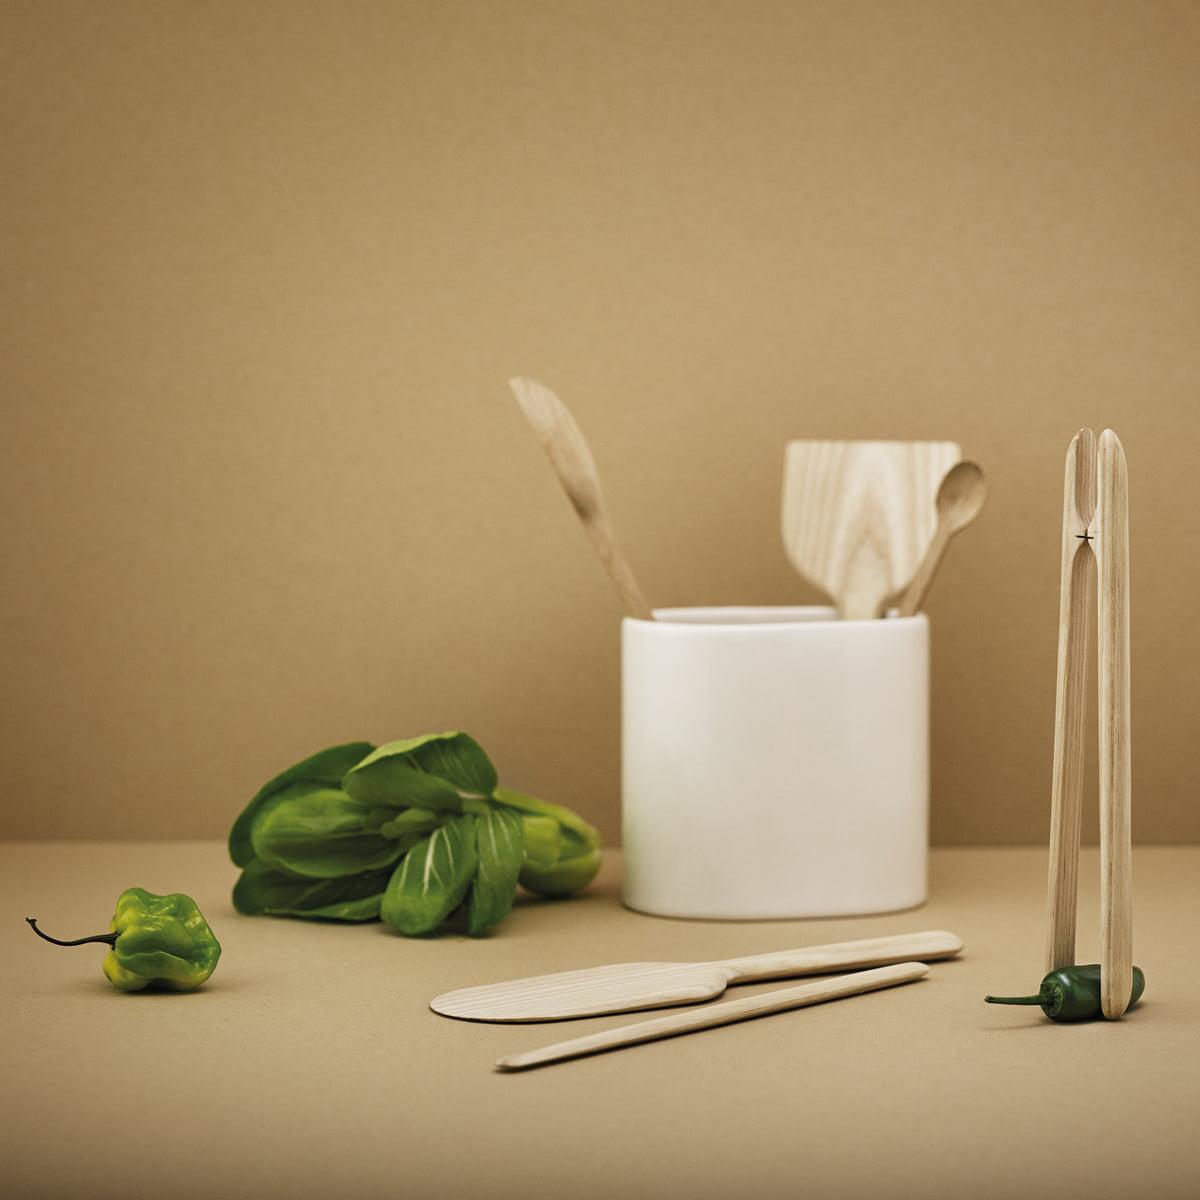 pince easy rig tig by stelton. Black Bedroom Furniture Sets. Home Design Ideas